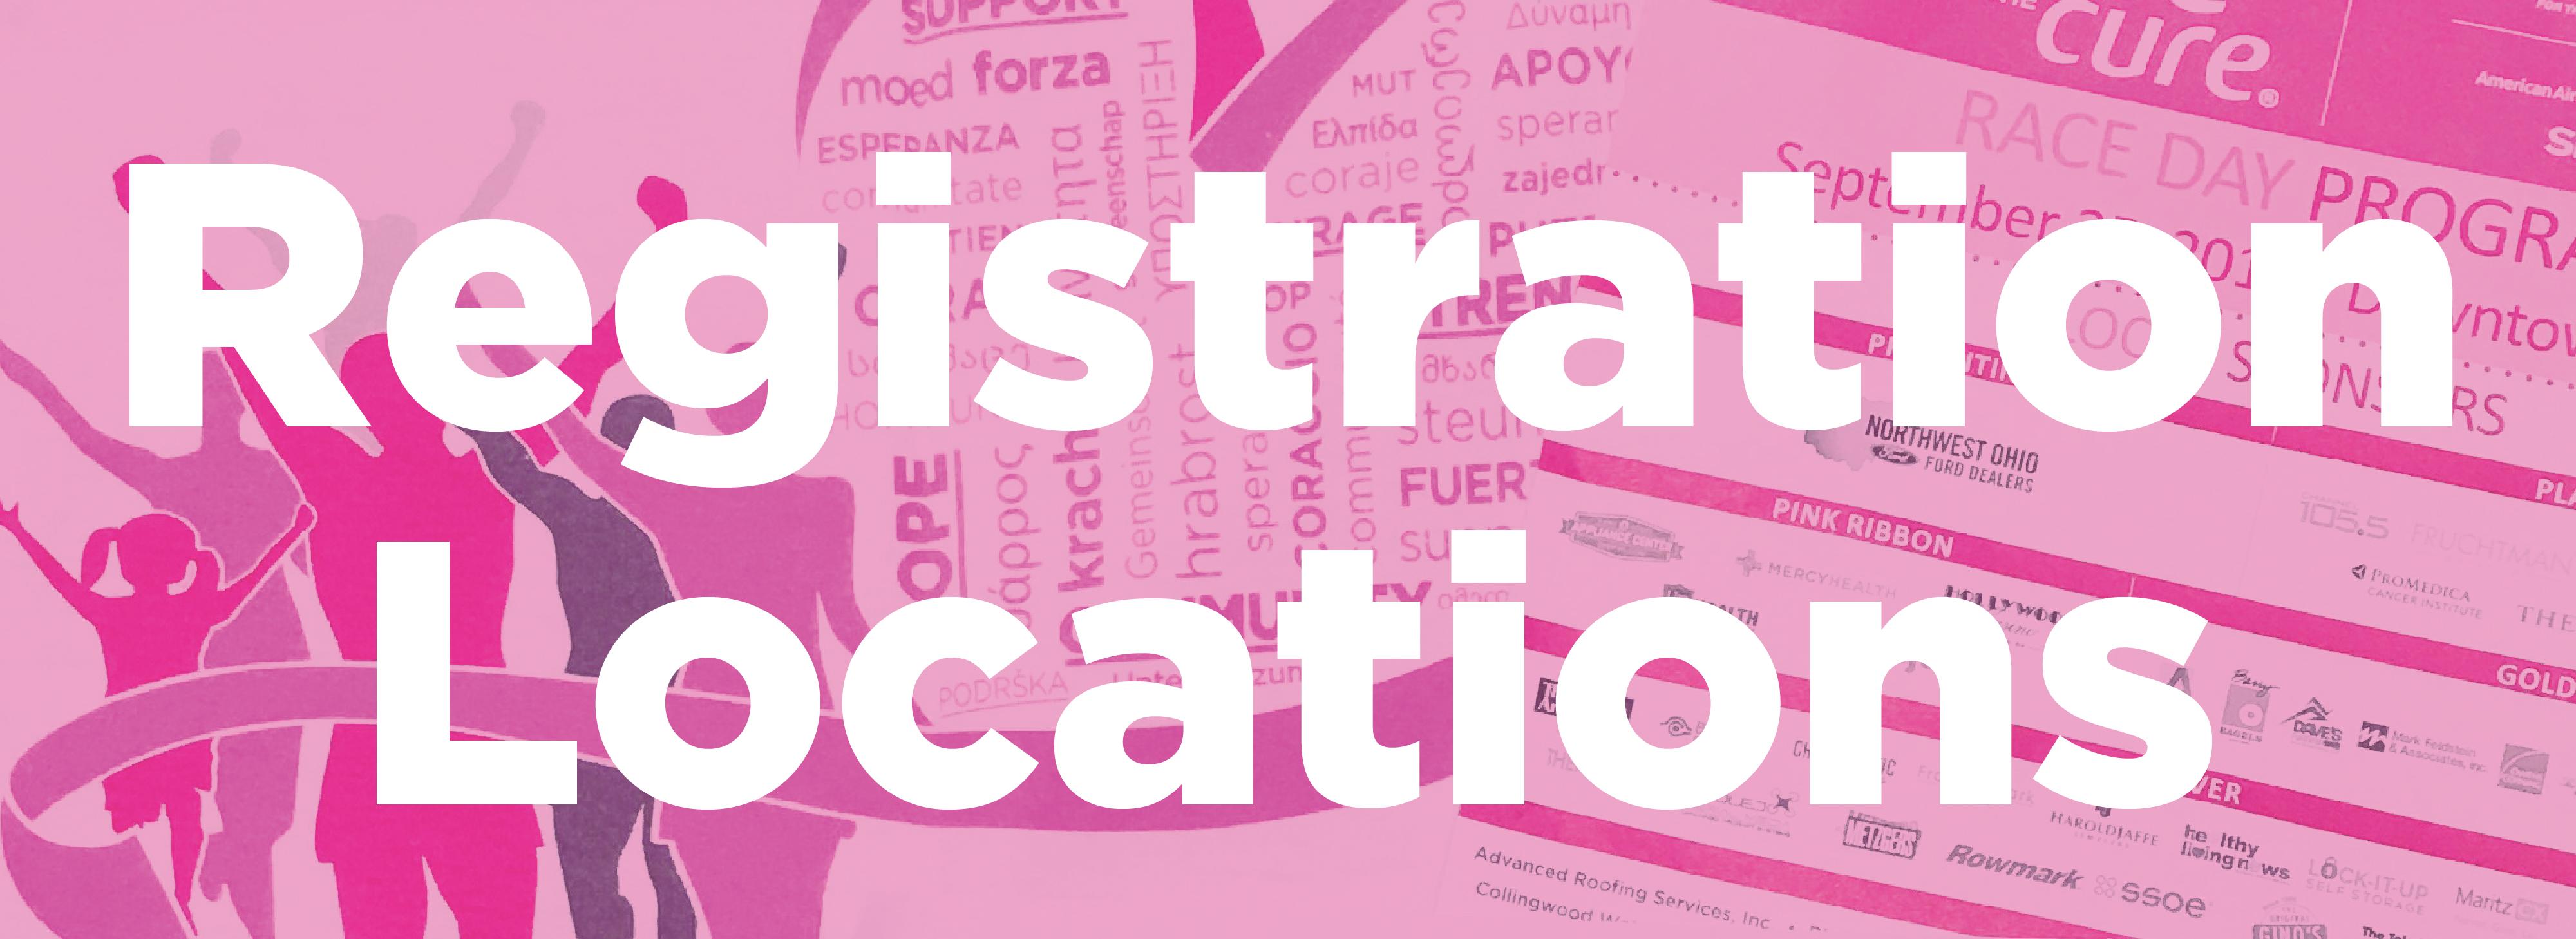 Registration-location-banner-01